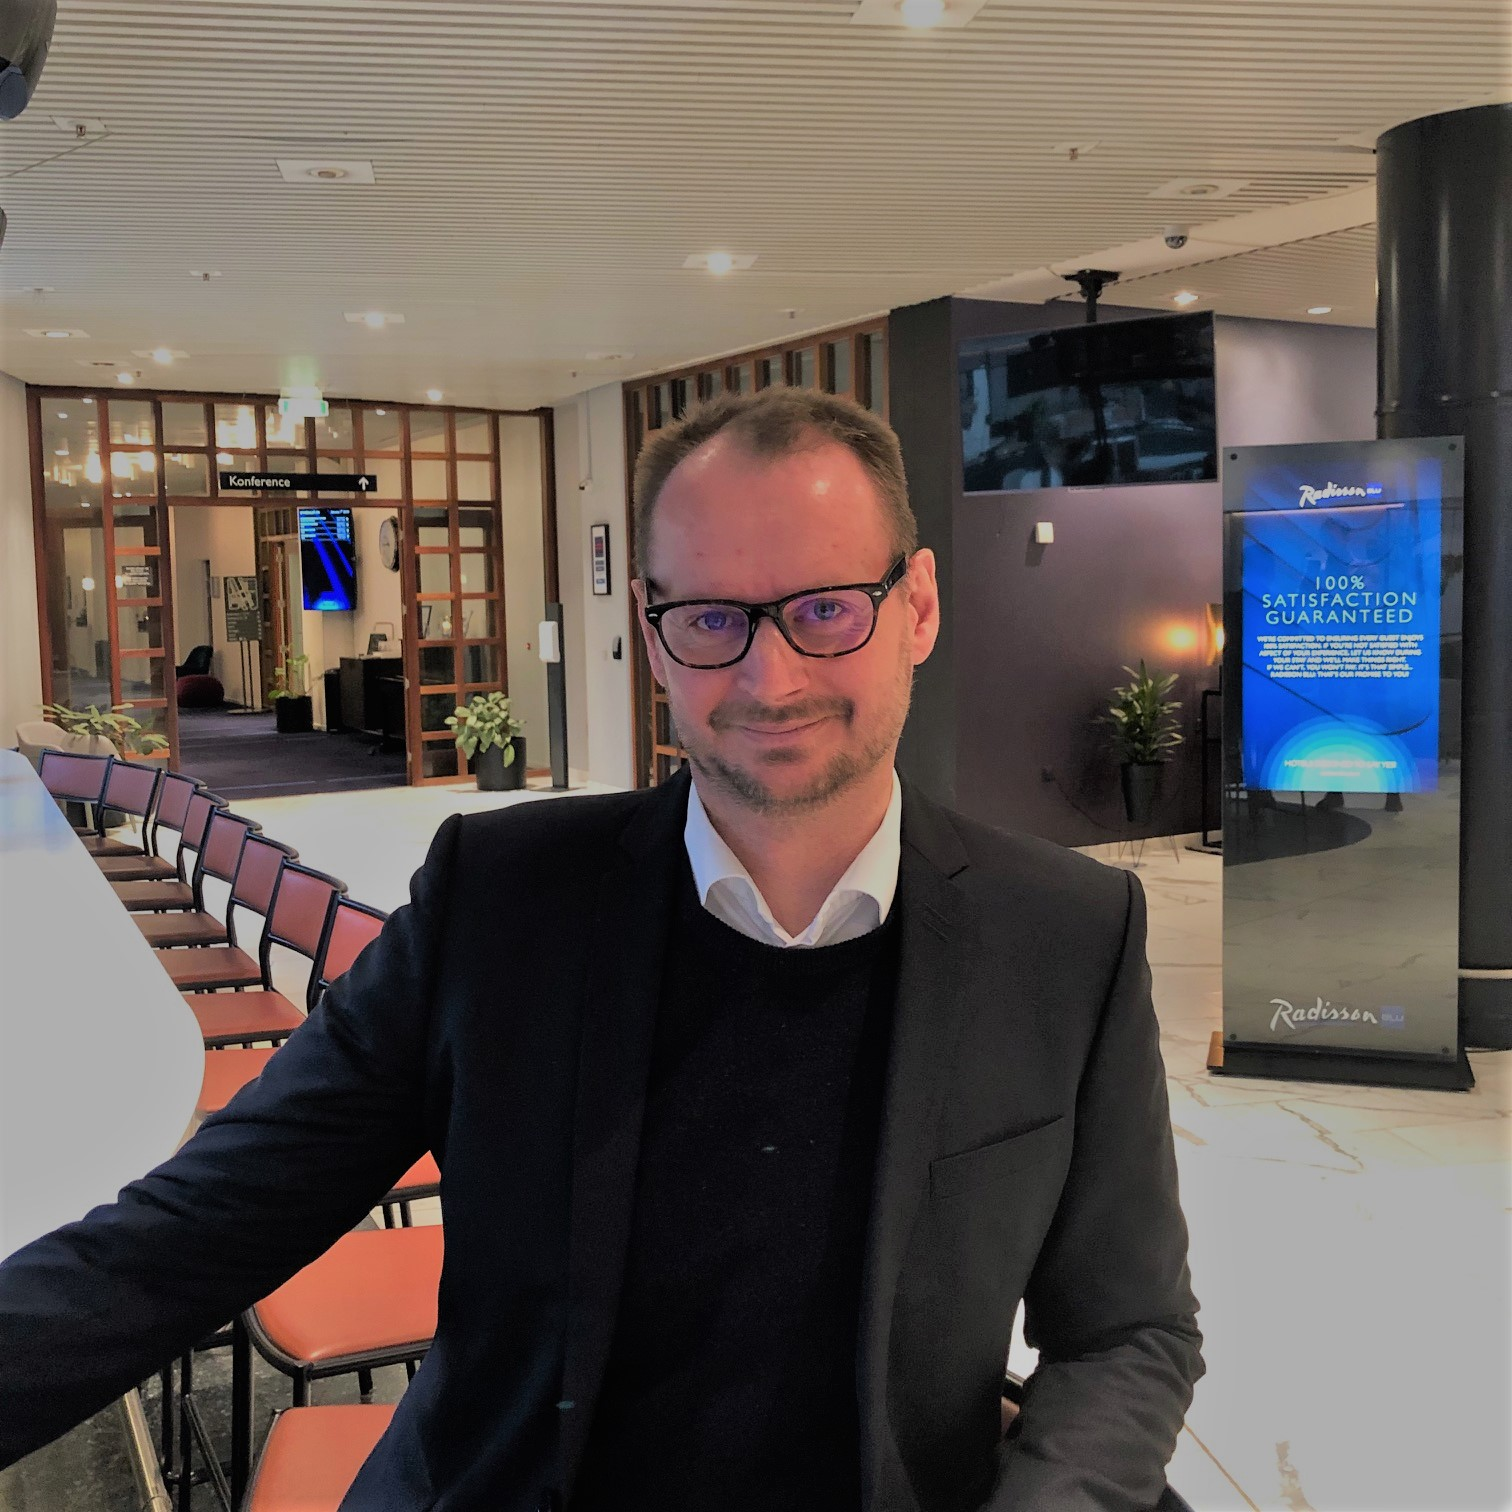 Kaj Berthelsen har netop fået nyt job hos Radisson Hotel Group med titel af Account Manager Western Denmark. Foto: Radisson Hotel Group.